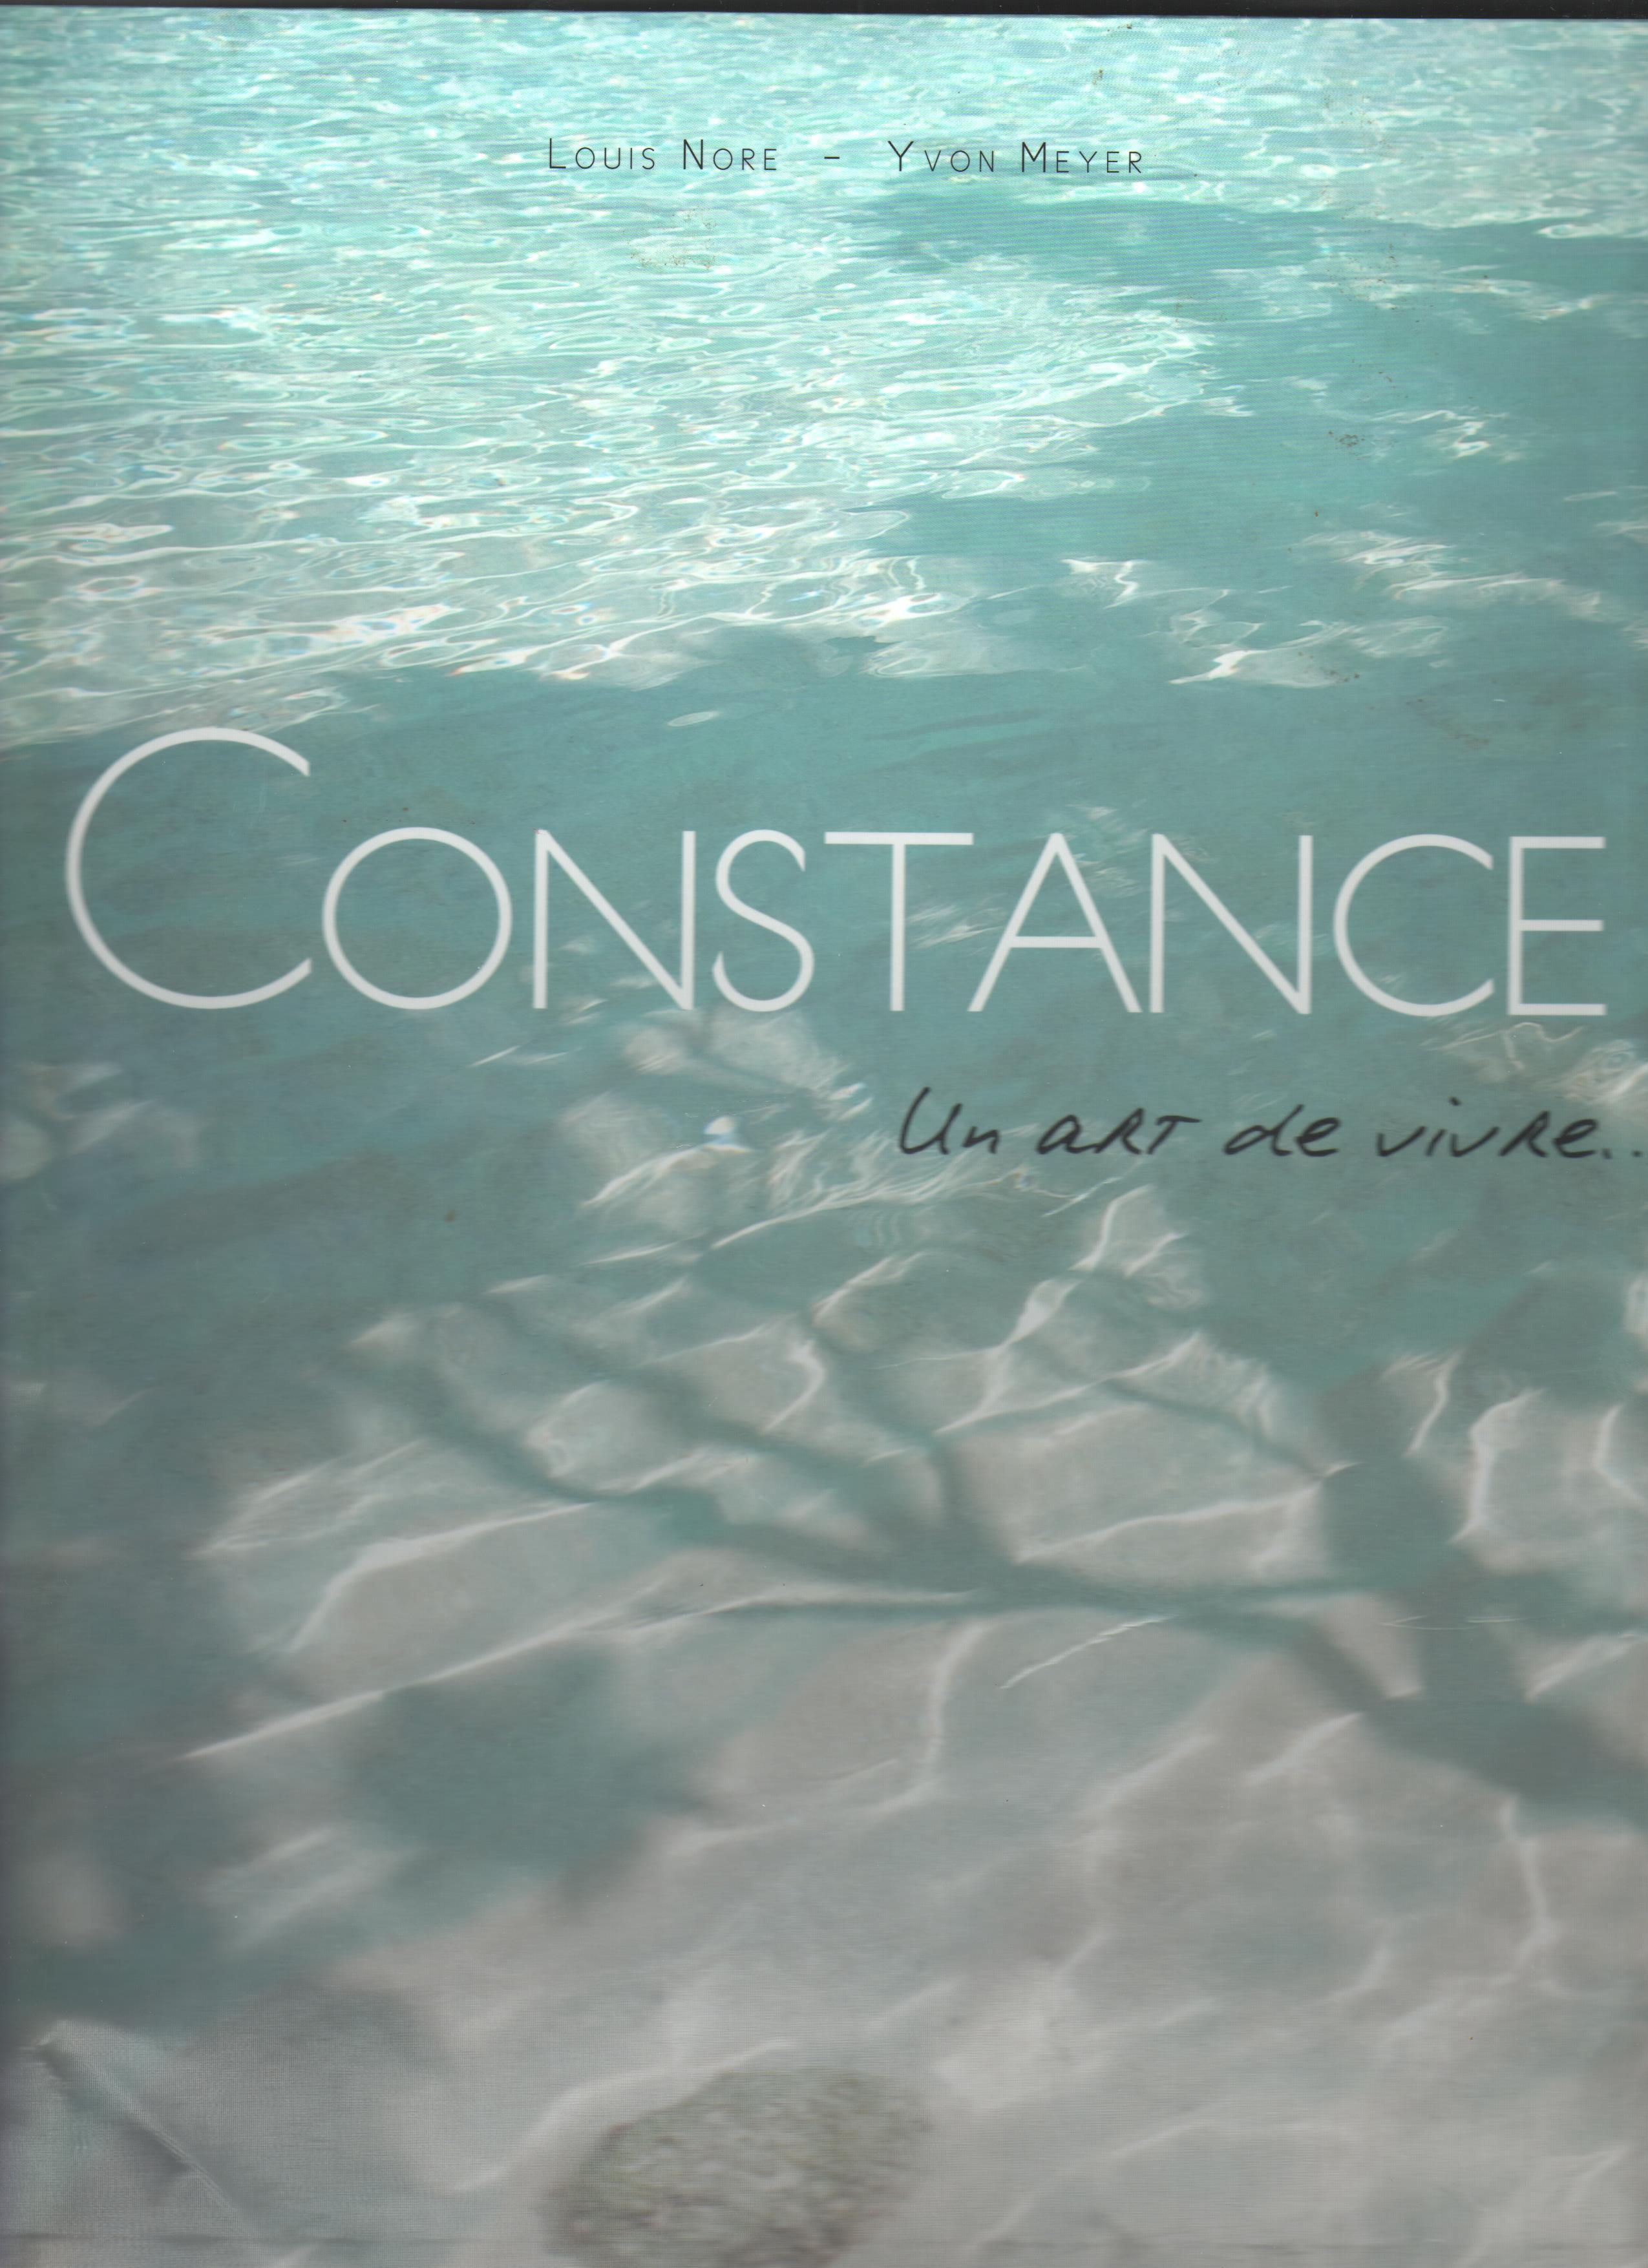 Constance2 001.jpg